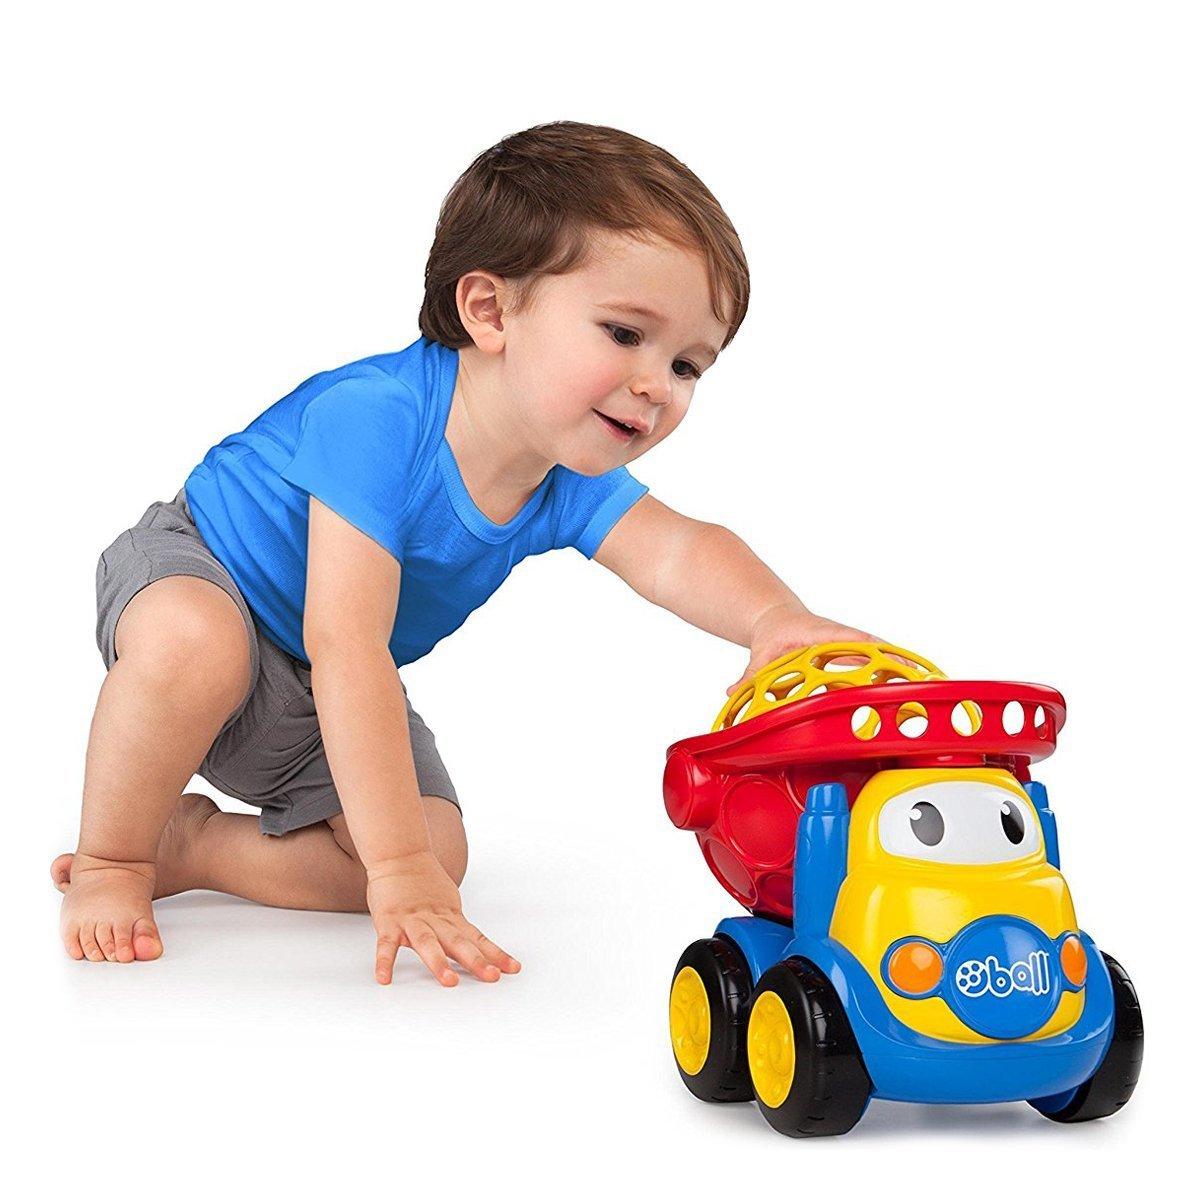 Купить Авто - мото, Машинка Bright Starts Oball Go Grippers Самосвал 10312 ТМ: Bright Starts